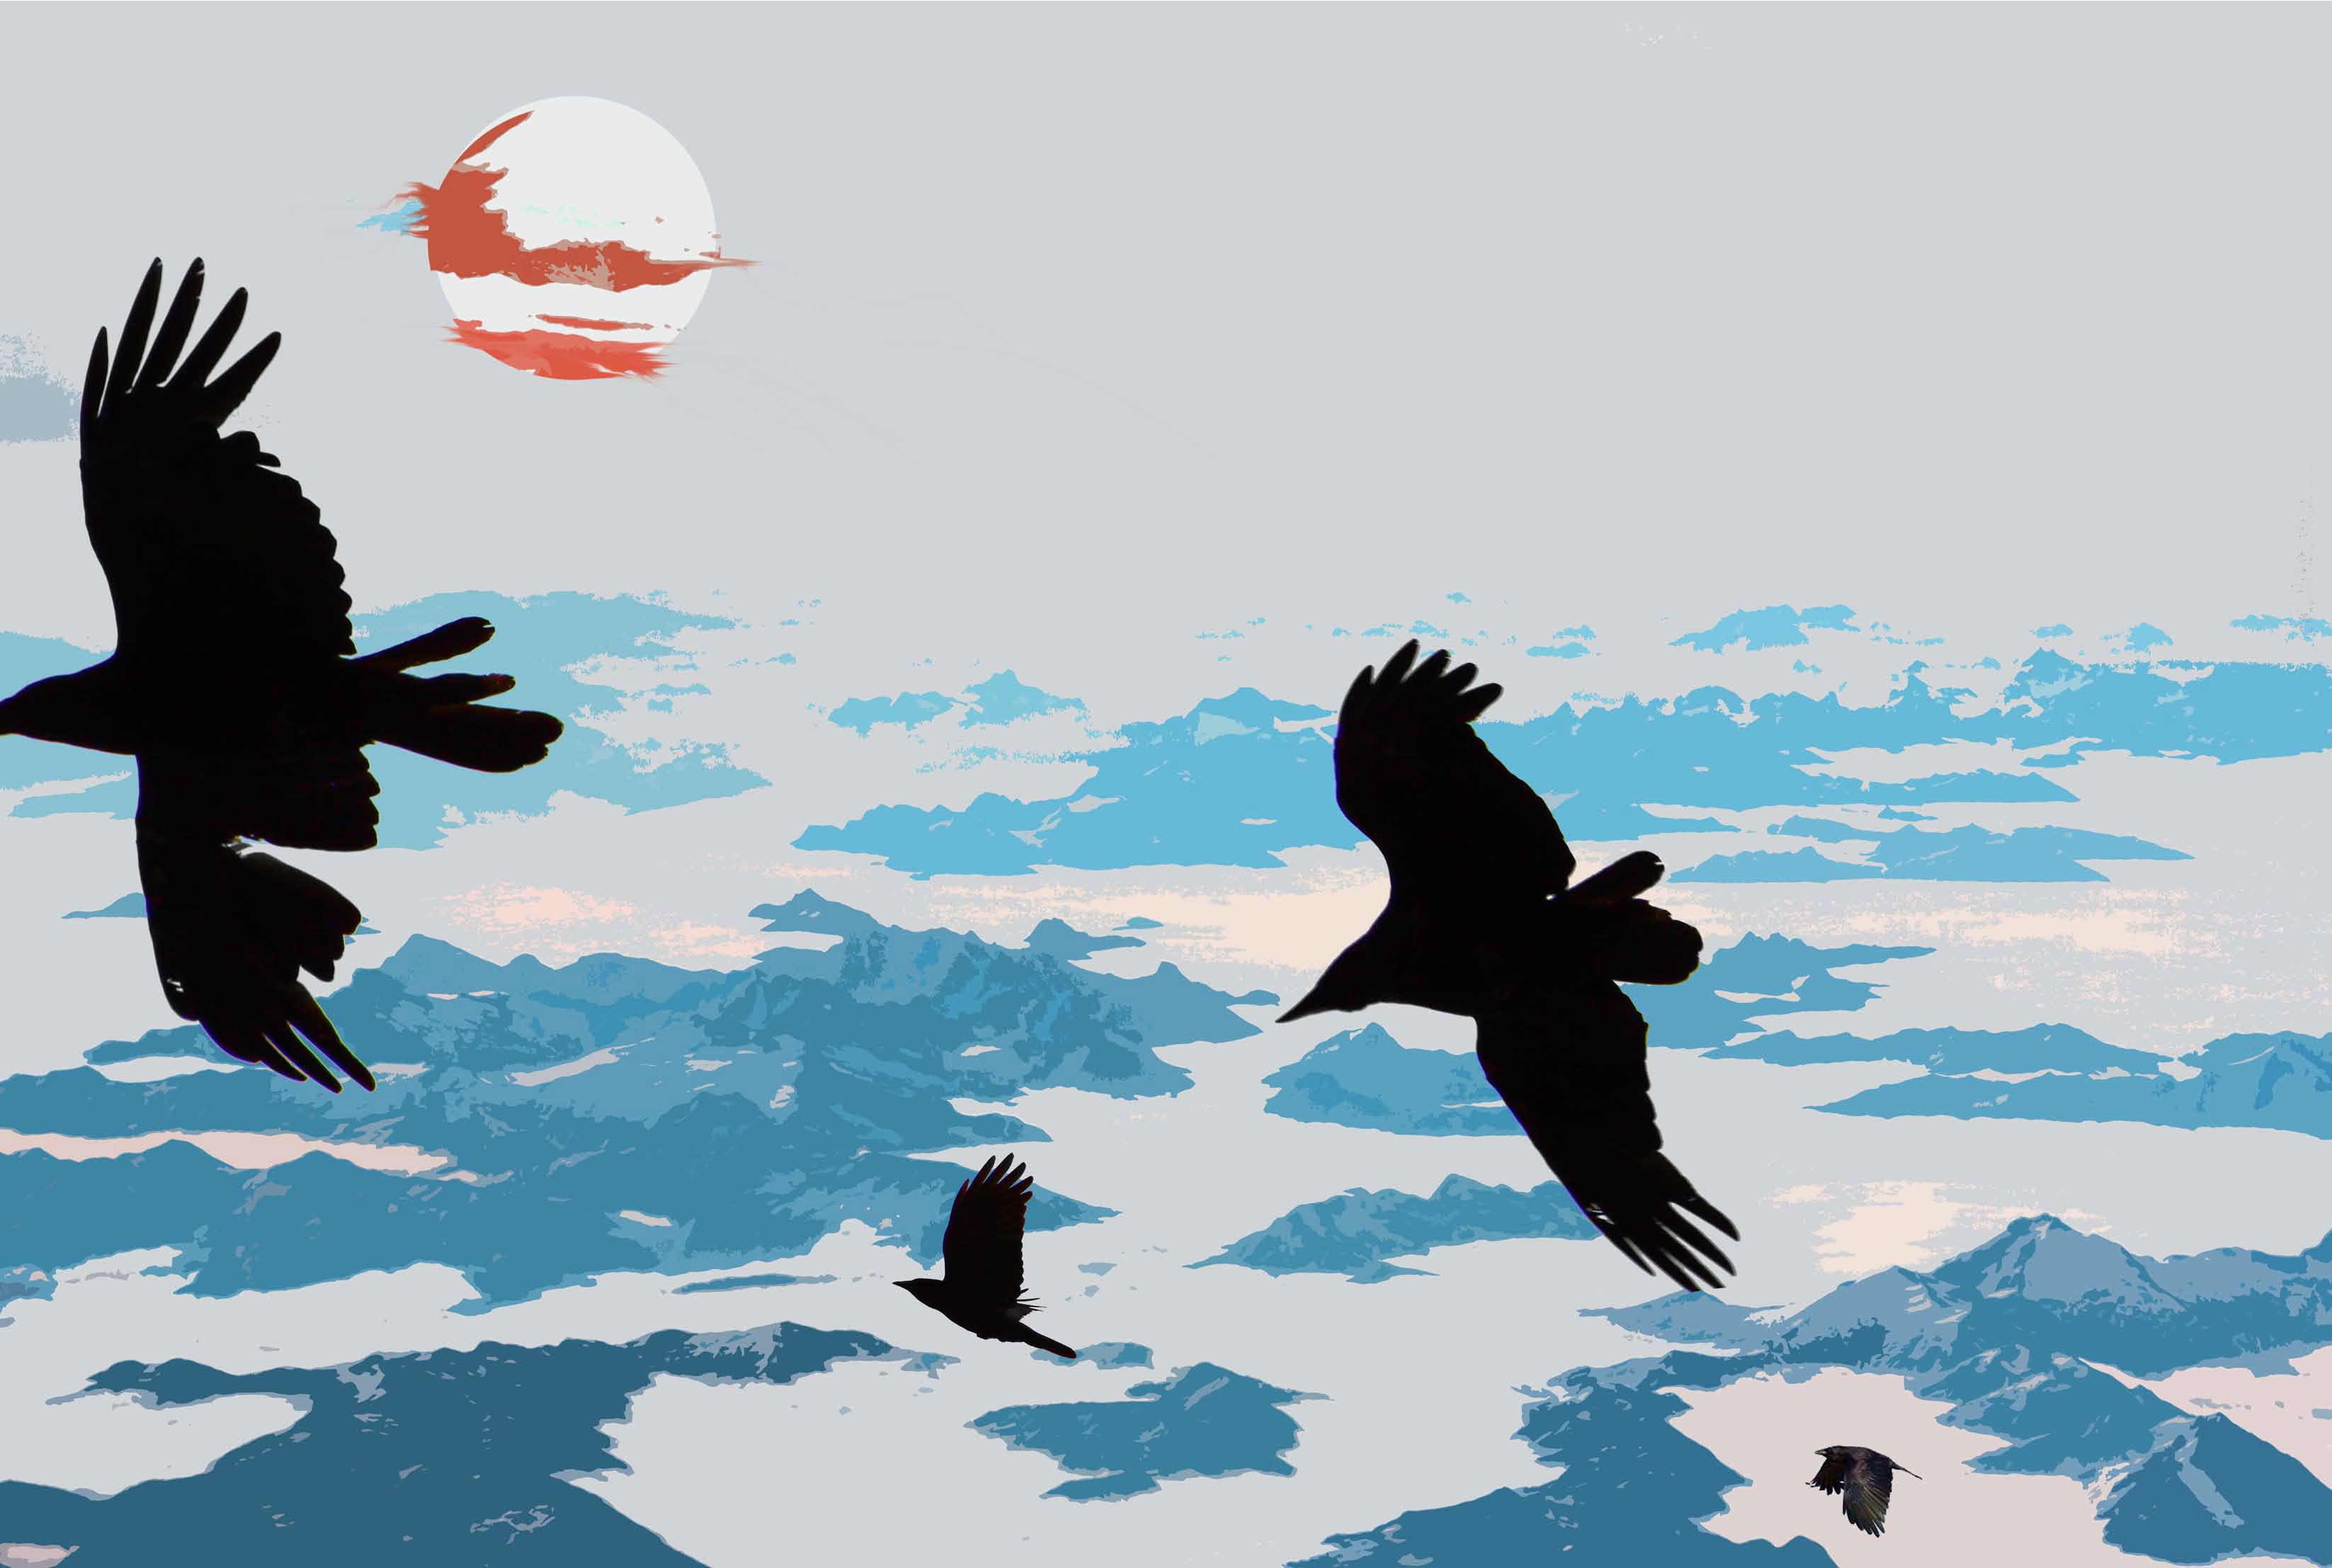 Raven's ride II